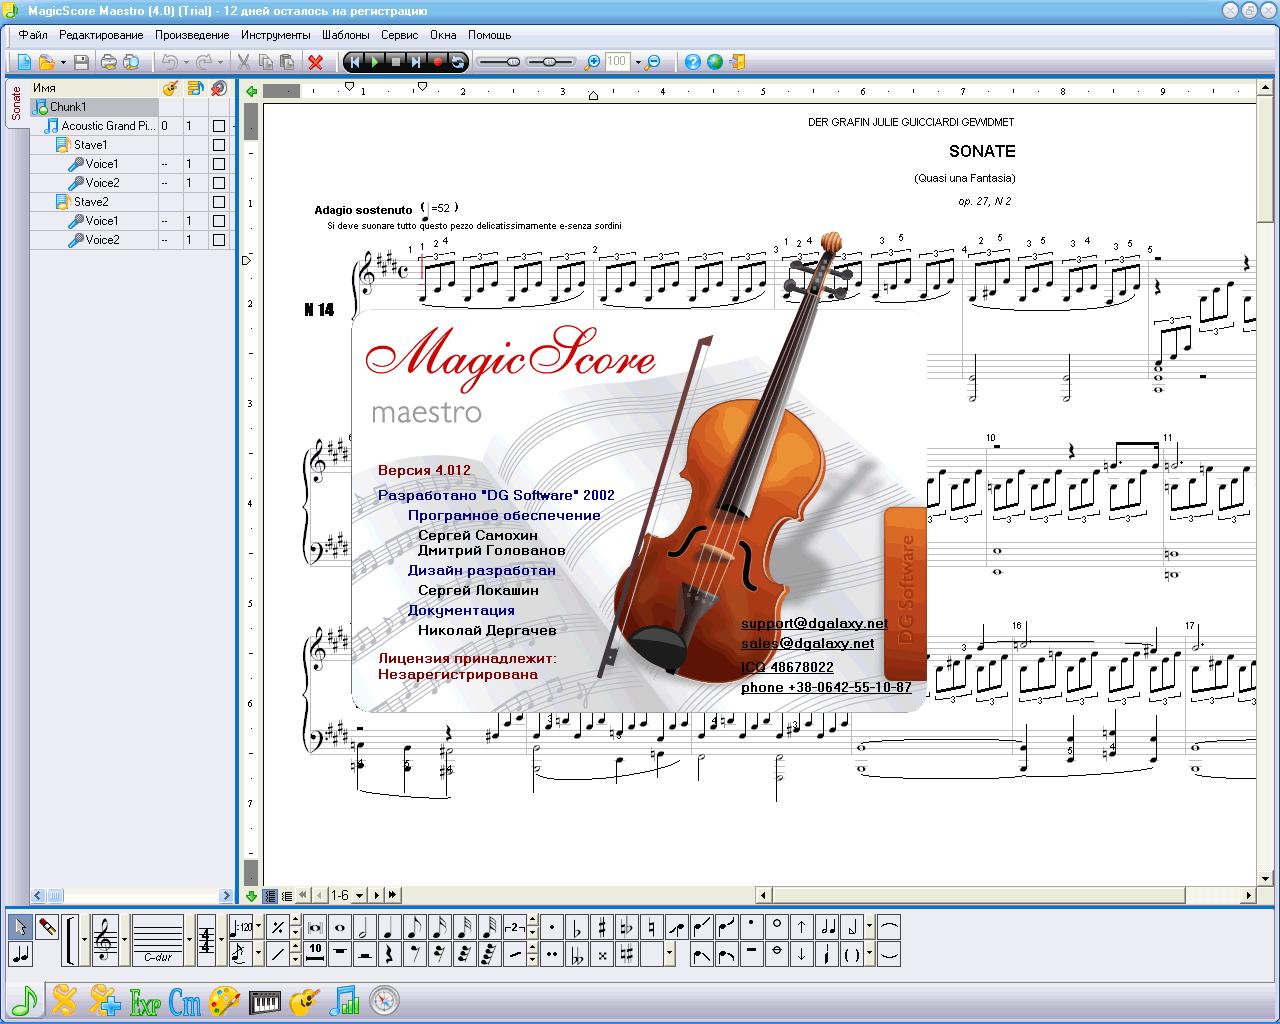 Magicscore Web Music Notation Software